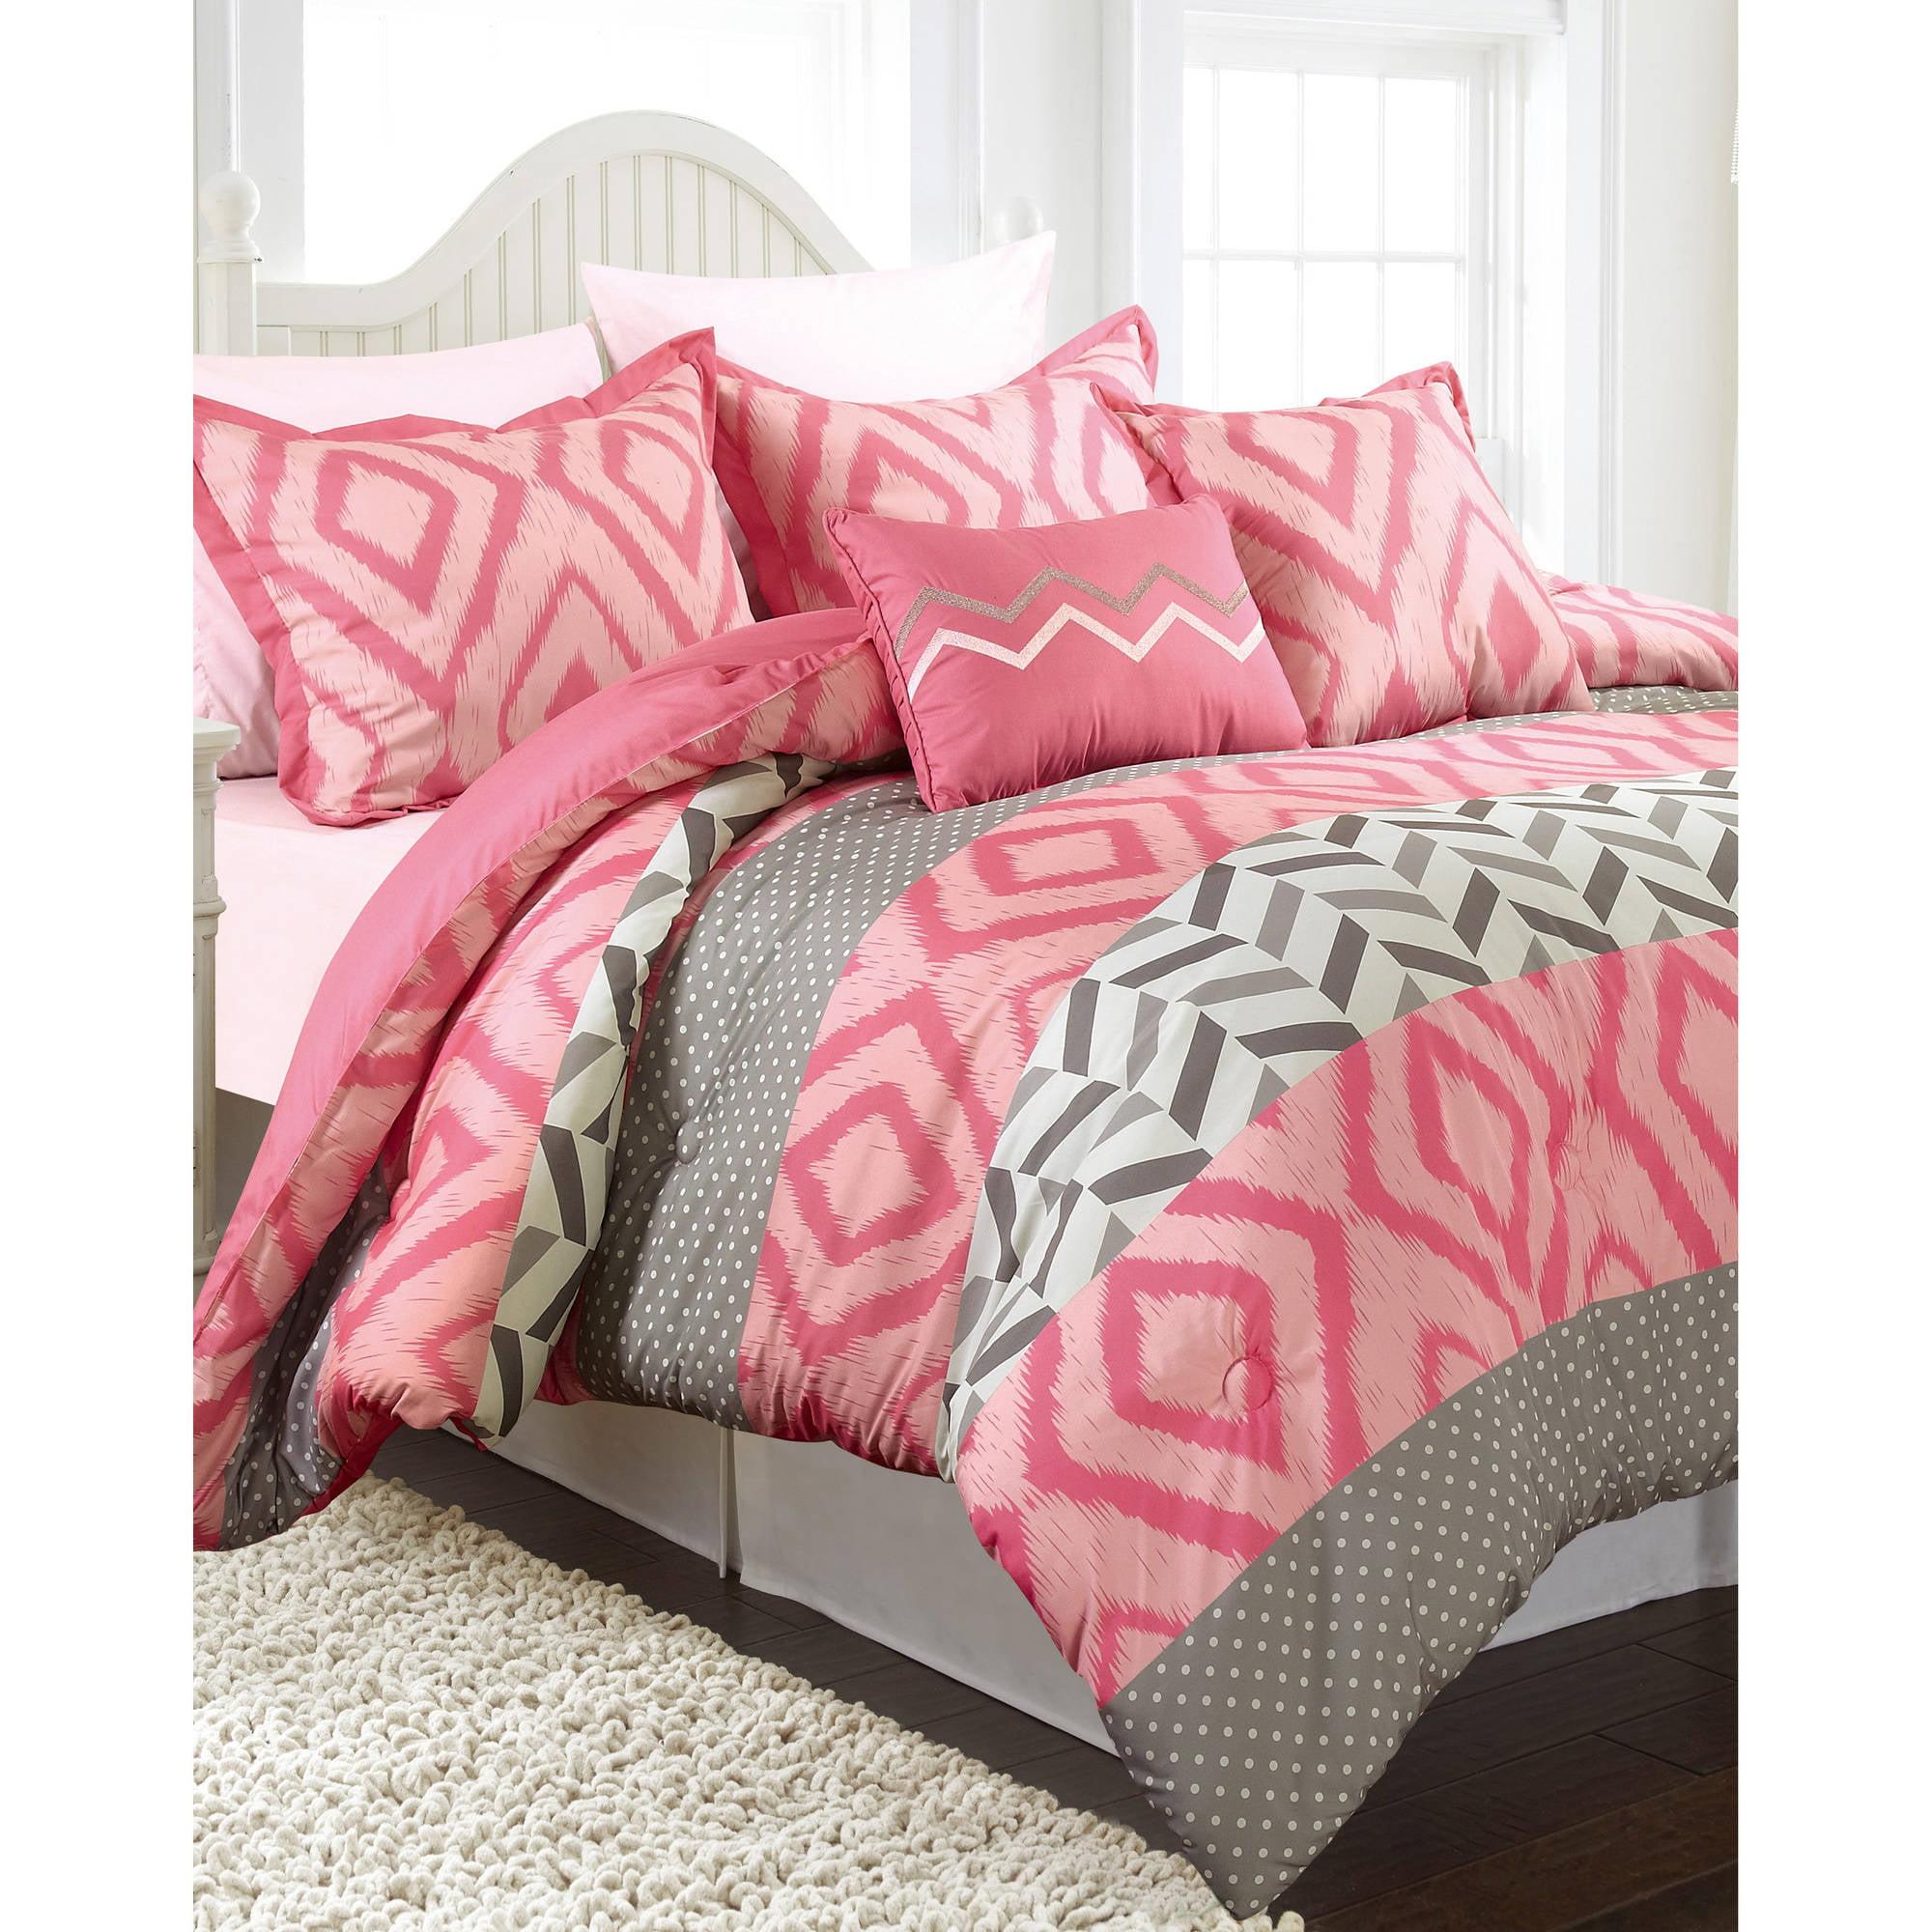 maddy 5piece bedding comforter set